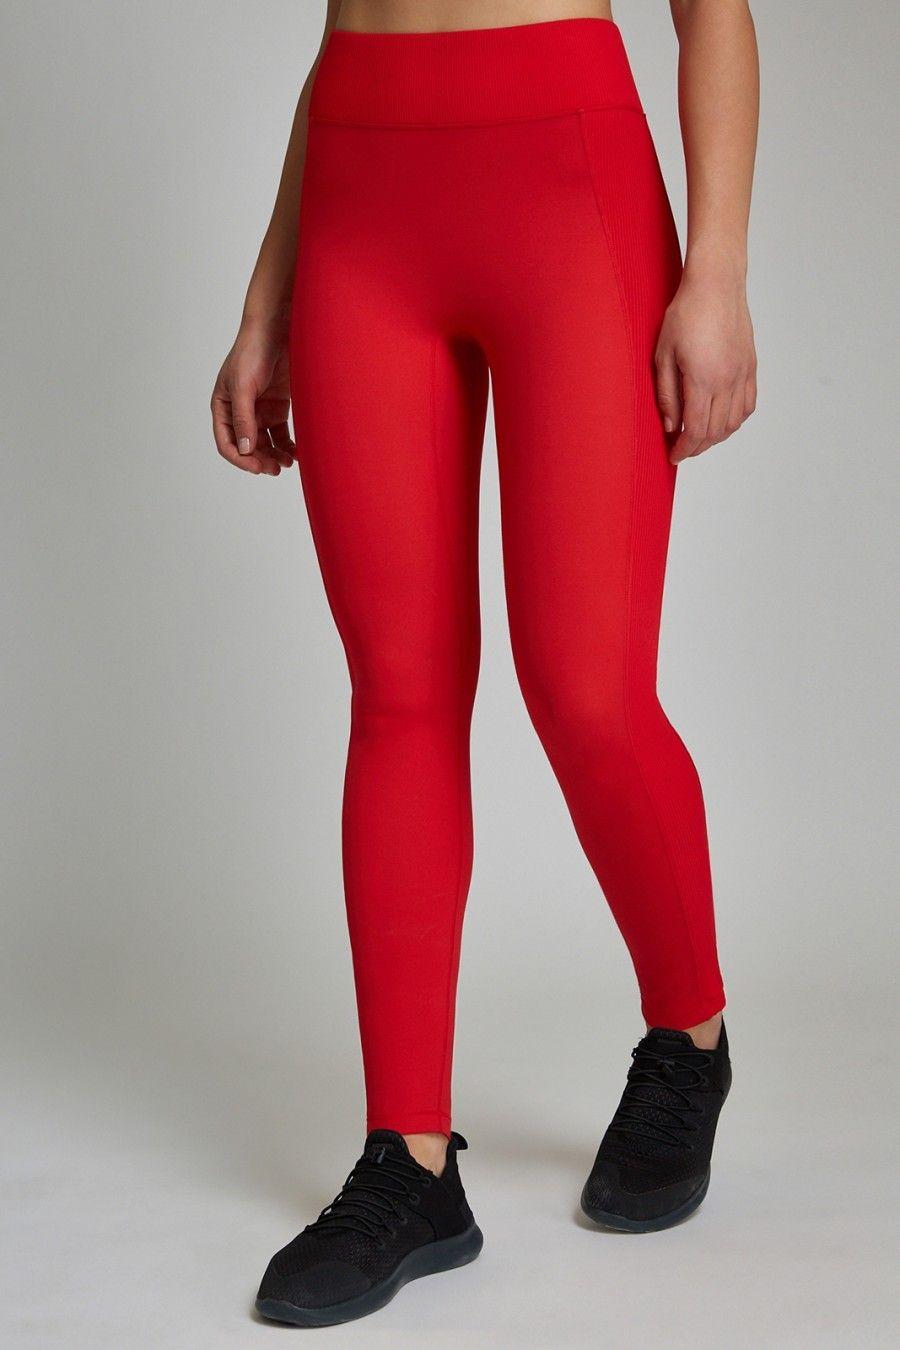 68d2f6f3ae09a6 All Access | Things to Wear | Sock leggings, Leggings, Red leggings